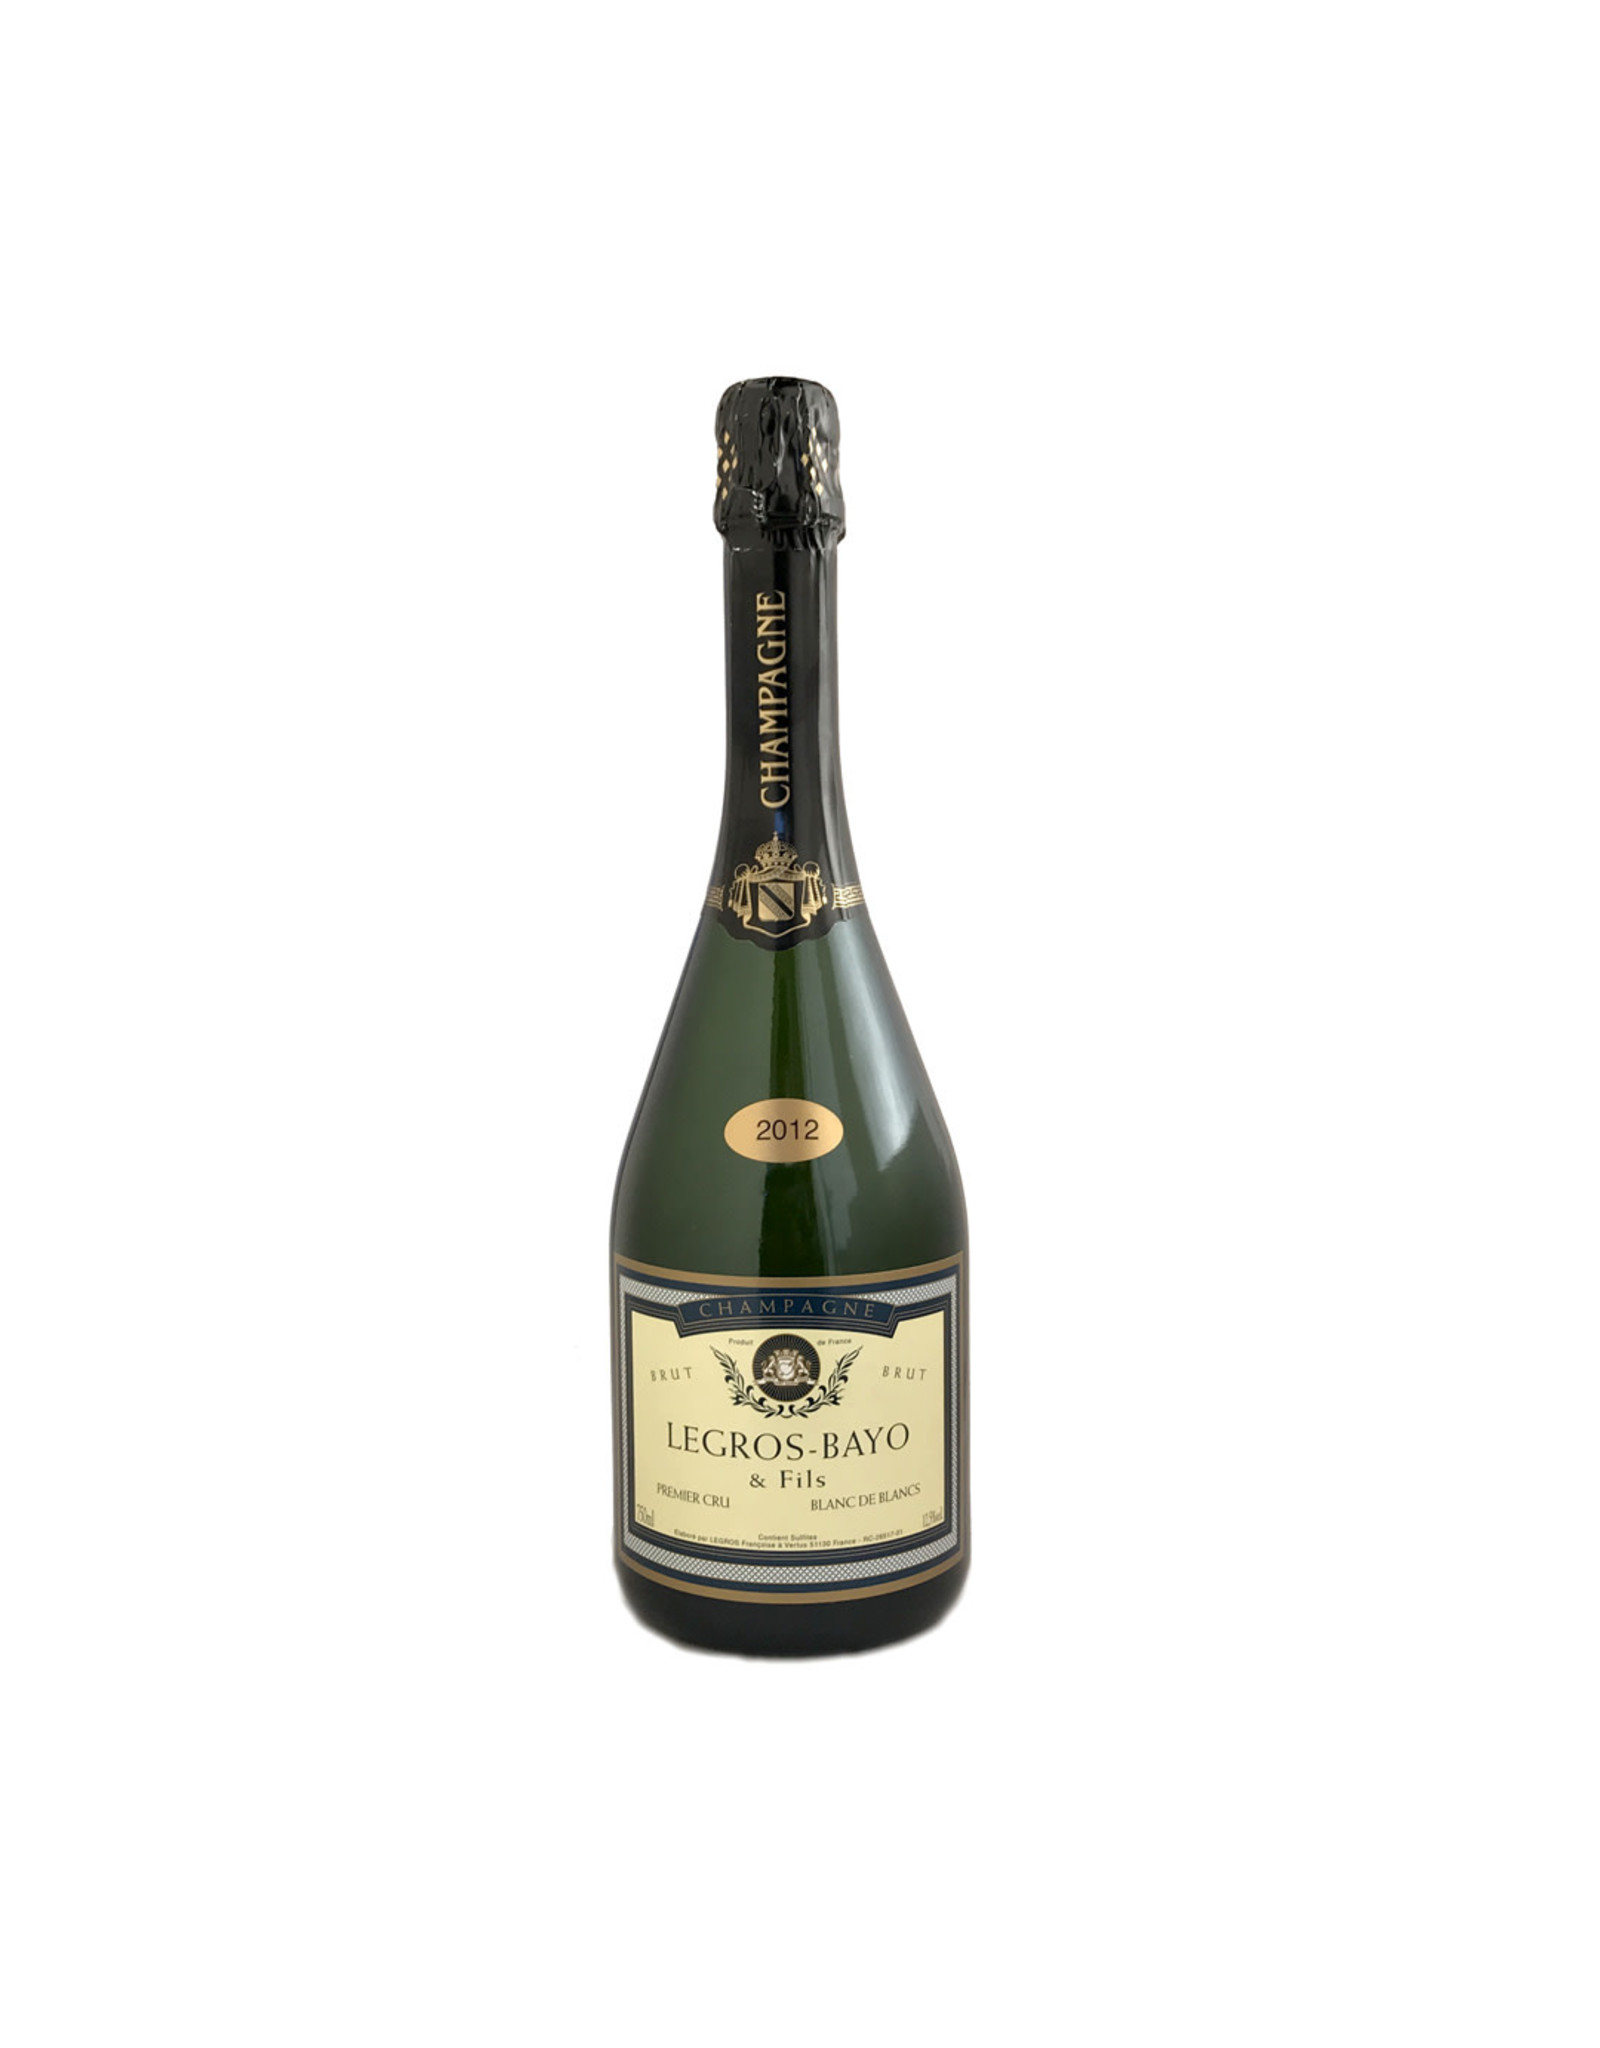 Legros Bayo & Fils Premier Cru Champagne 2012